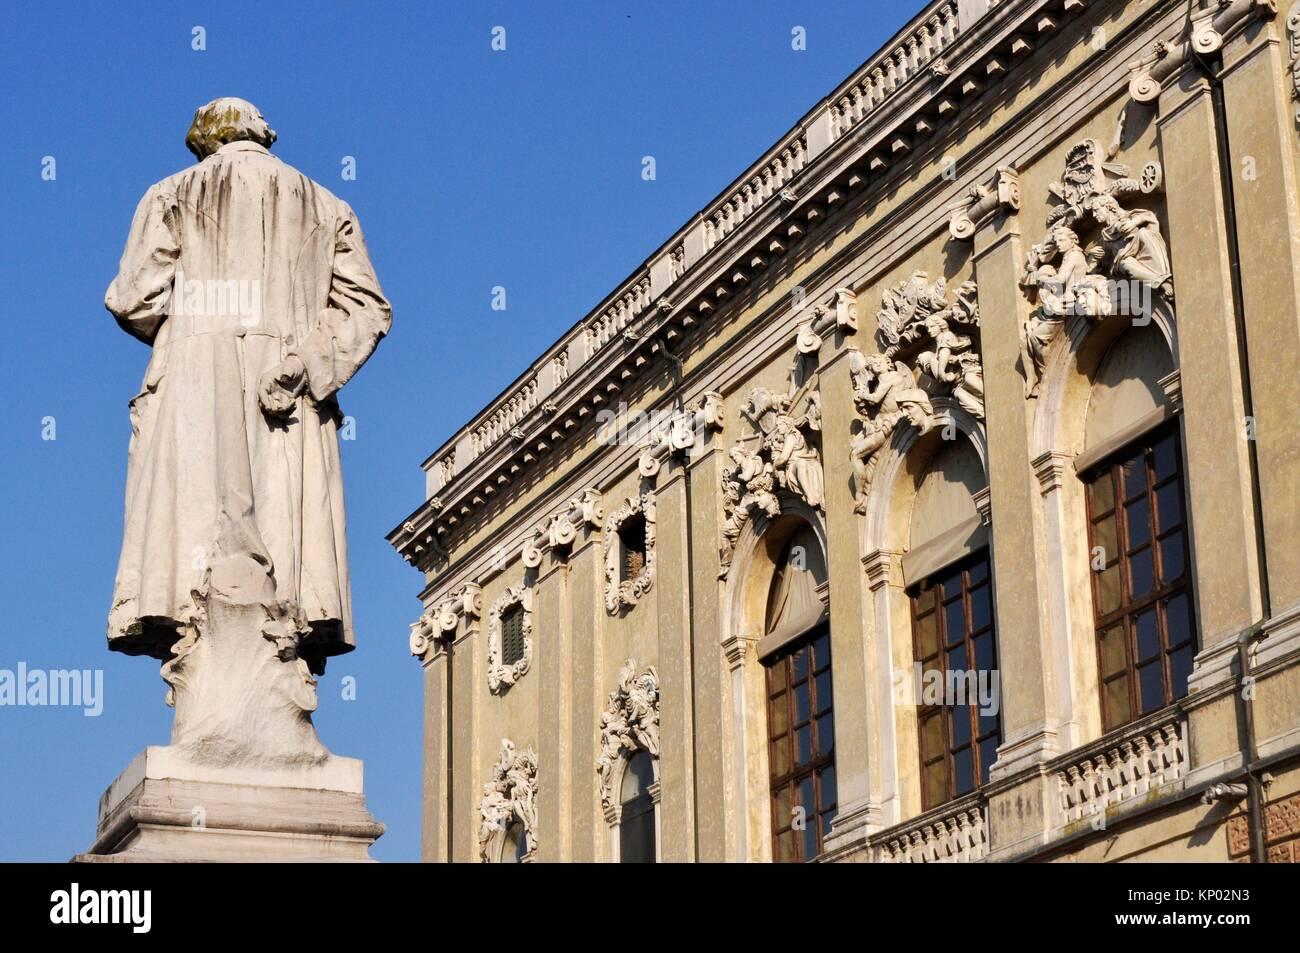 Vicenza, Italy: the Banca d´Italia and the statue of poet Giacomo Zanella in piazza San Lorenzo - Stock Image